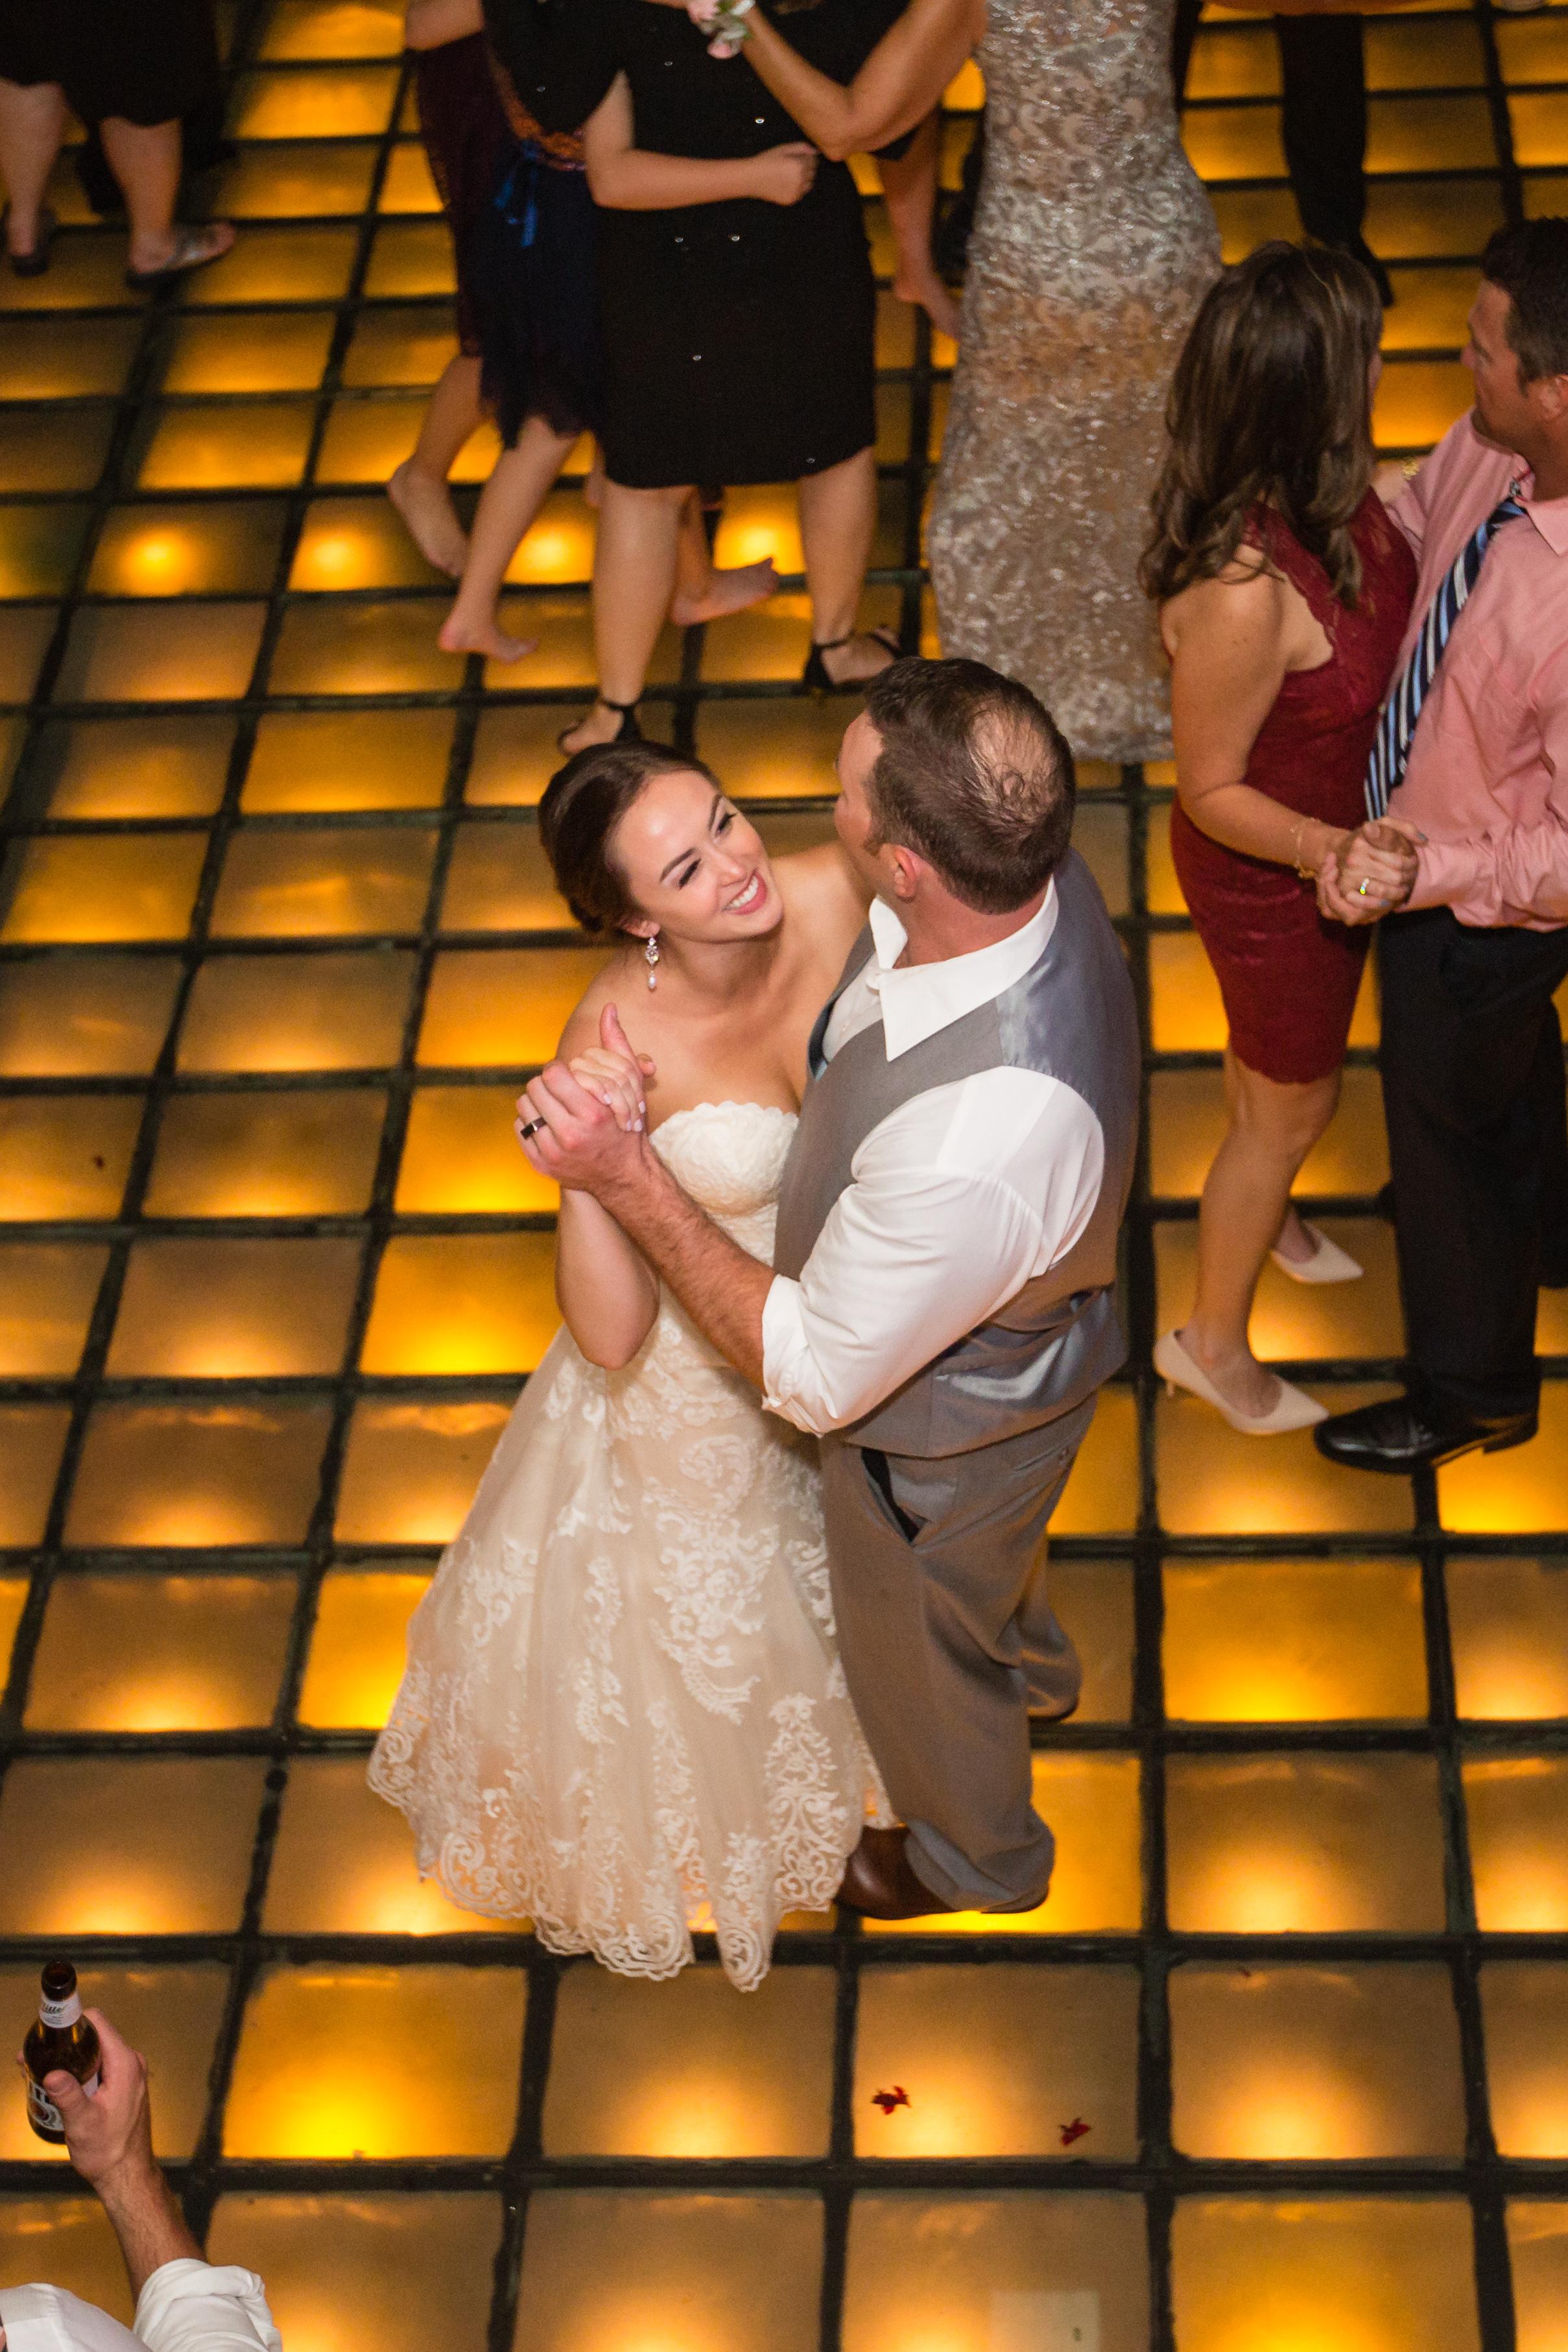 Courtney-Andy-Wedding-Blog-10.jpg